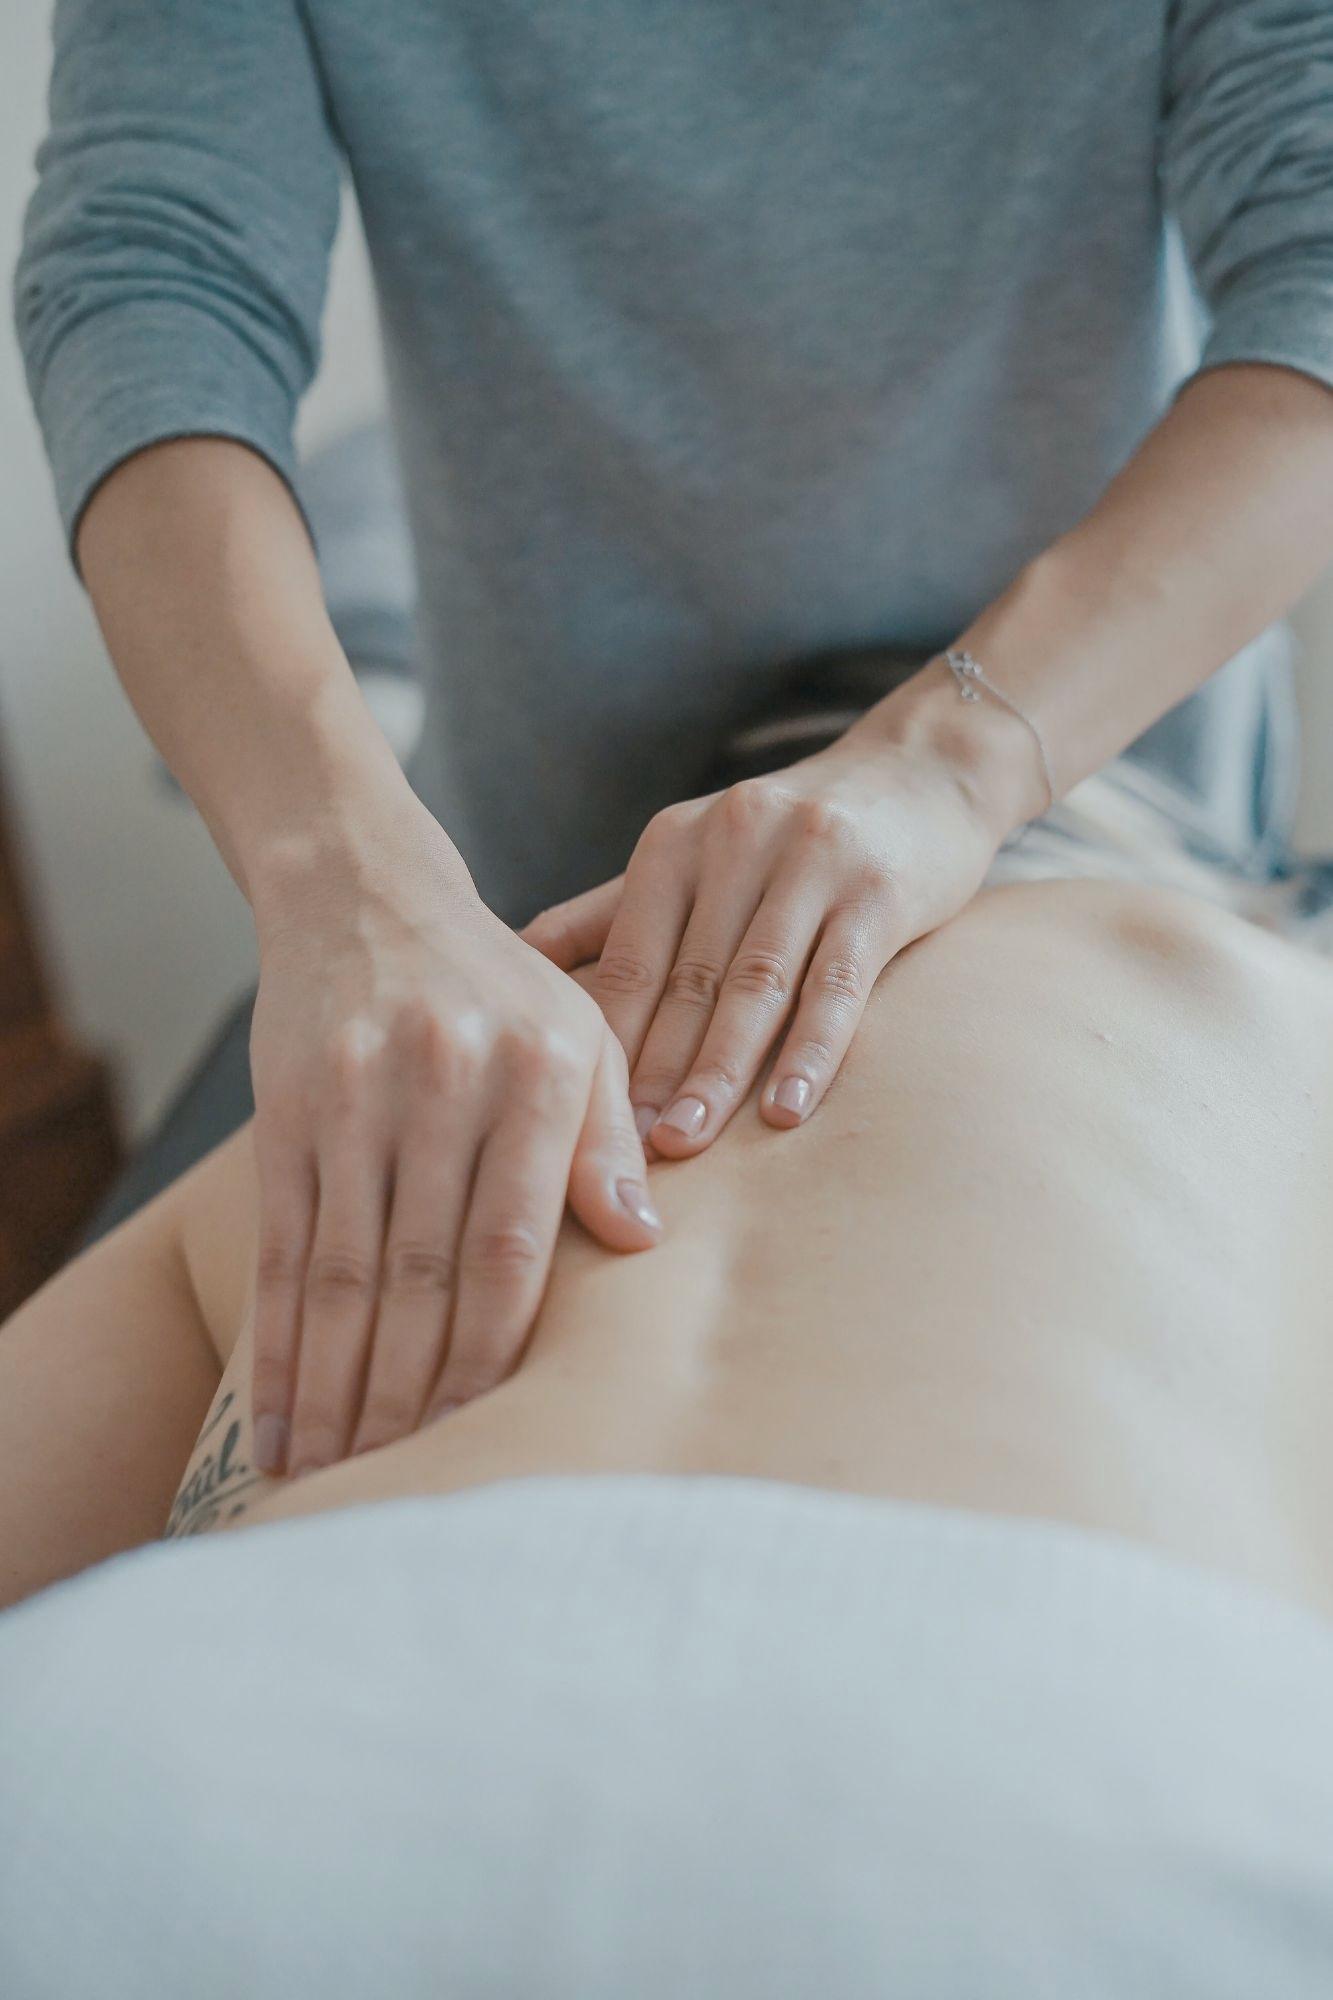 Calico Pregnancy Massage Postnatal Massage